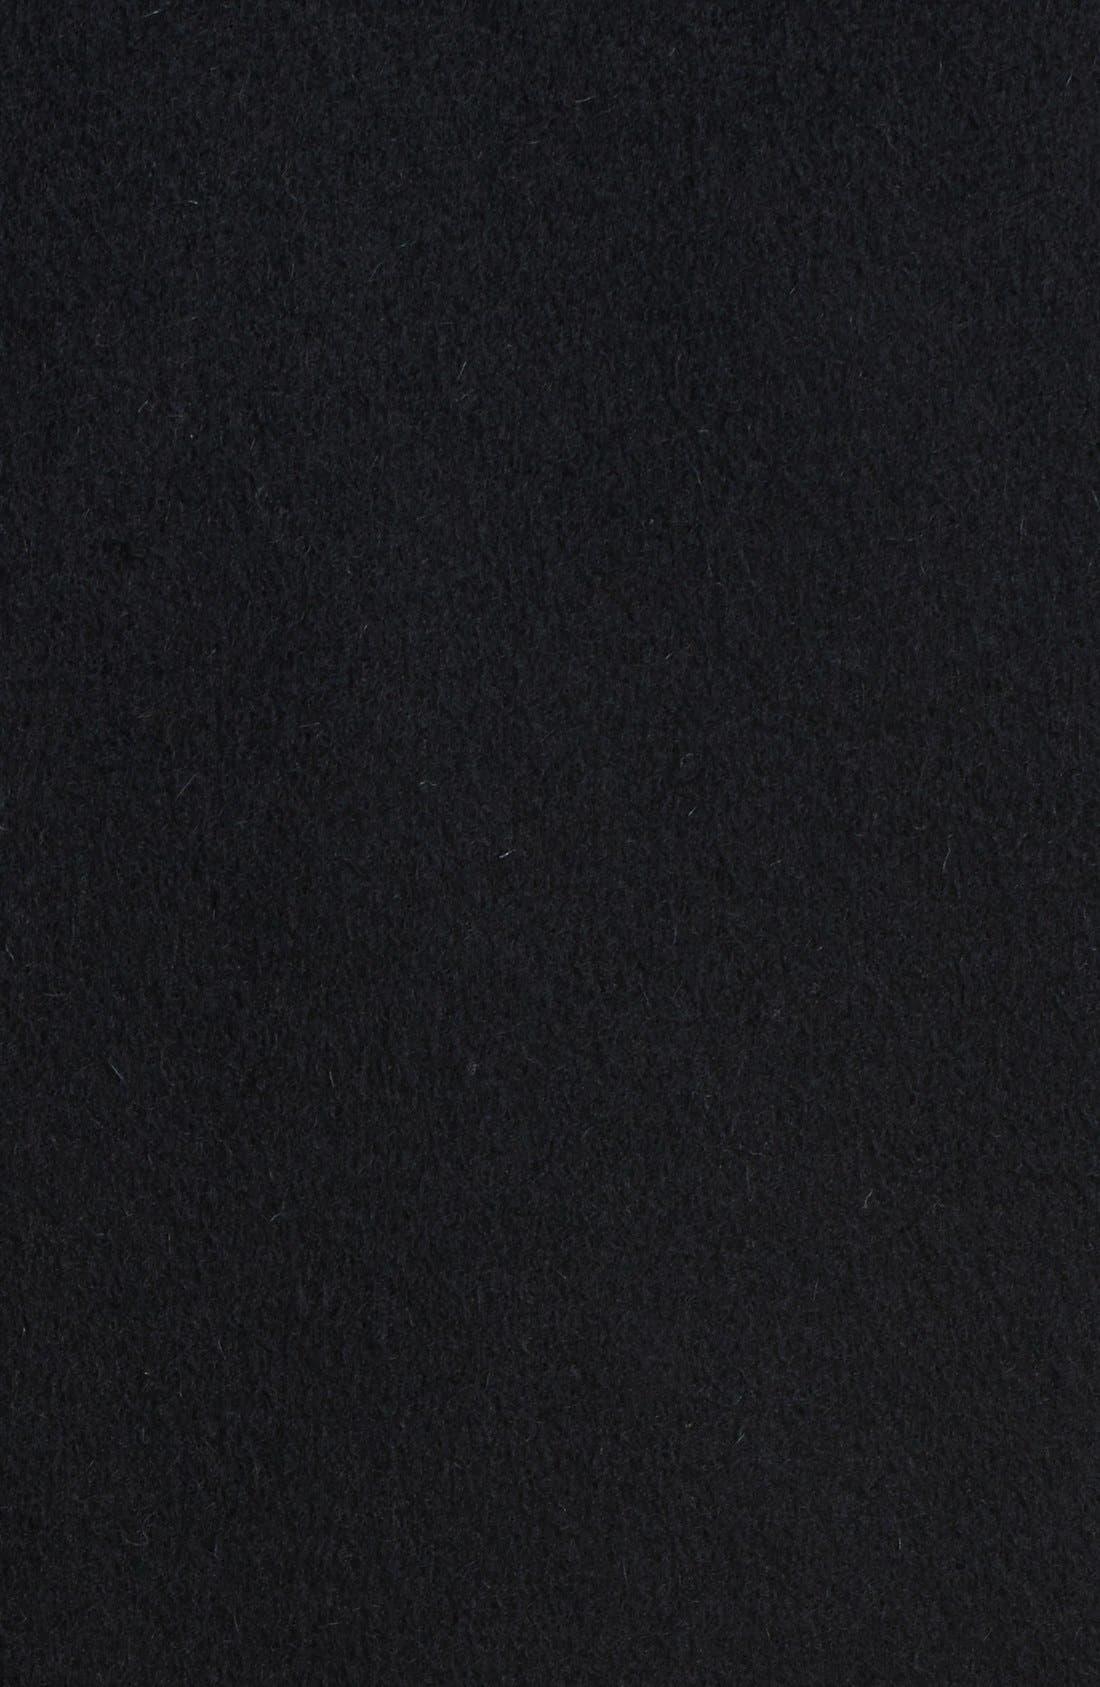 Alternate Image 3  - Burberry London 'Basingstoke' Wool & Cashmere Coat